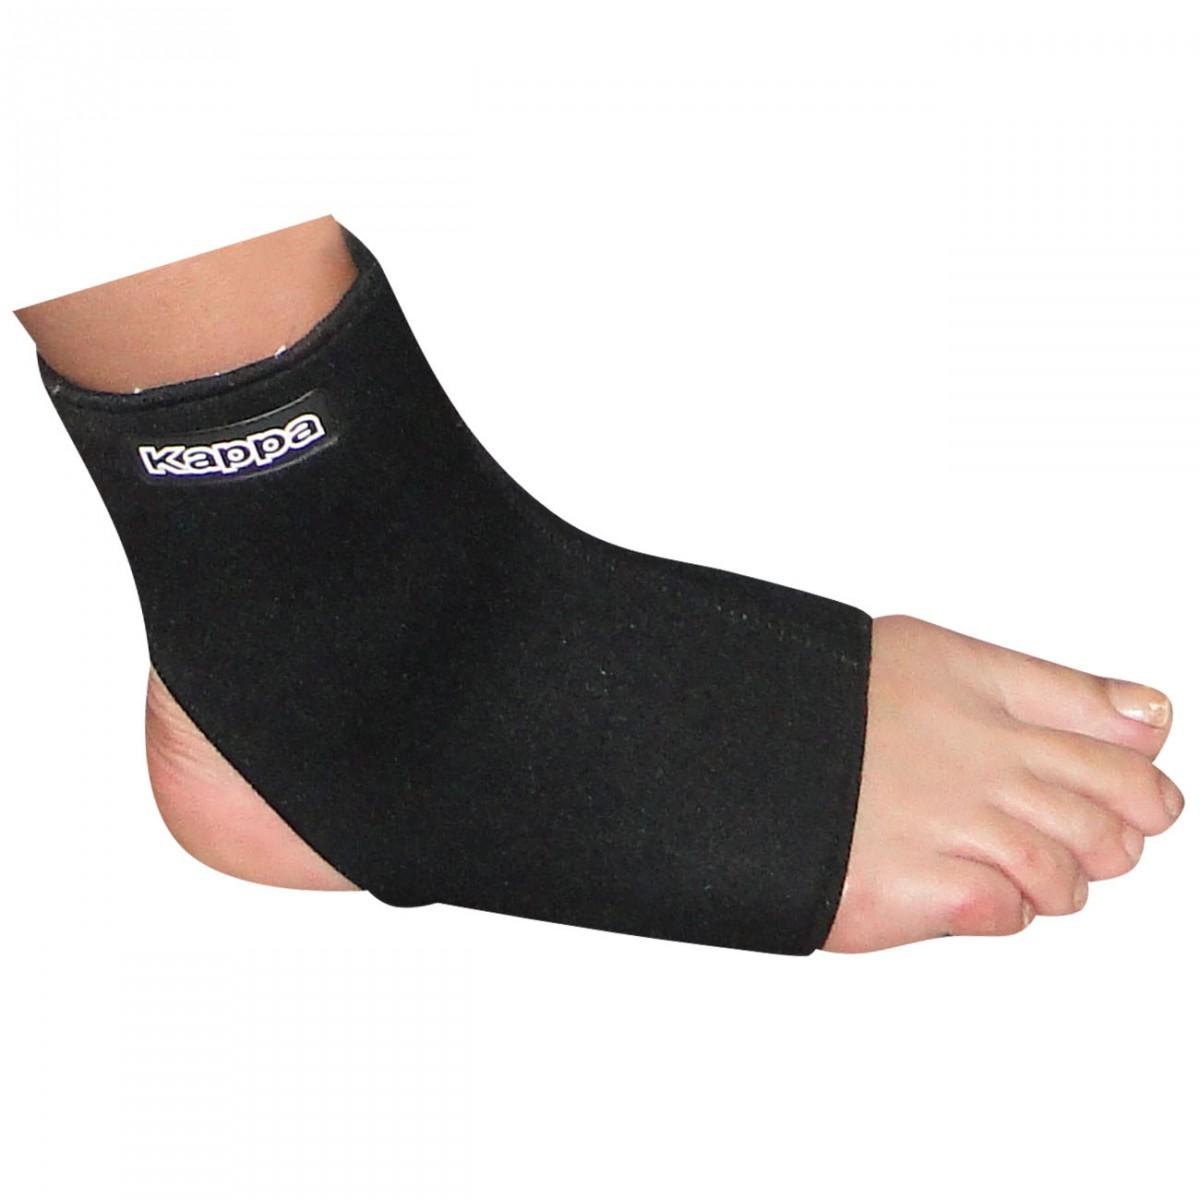 abcb4125ab172 Tornozeleira Kappa 57993 579993 - Preto - Chuteira Nike, Adidas. Sandalias  Femininas. Sandy Calçados